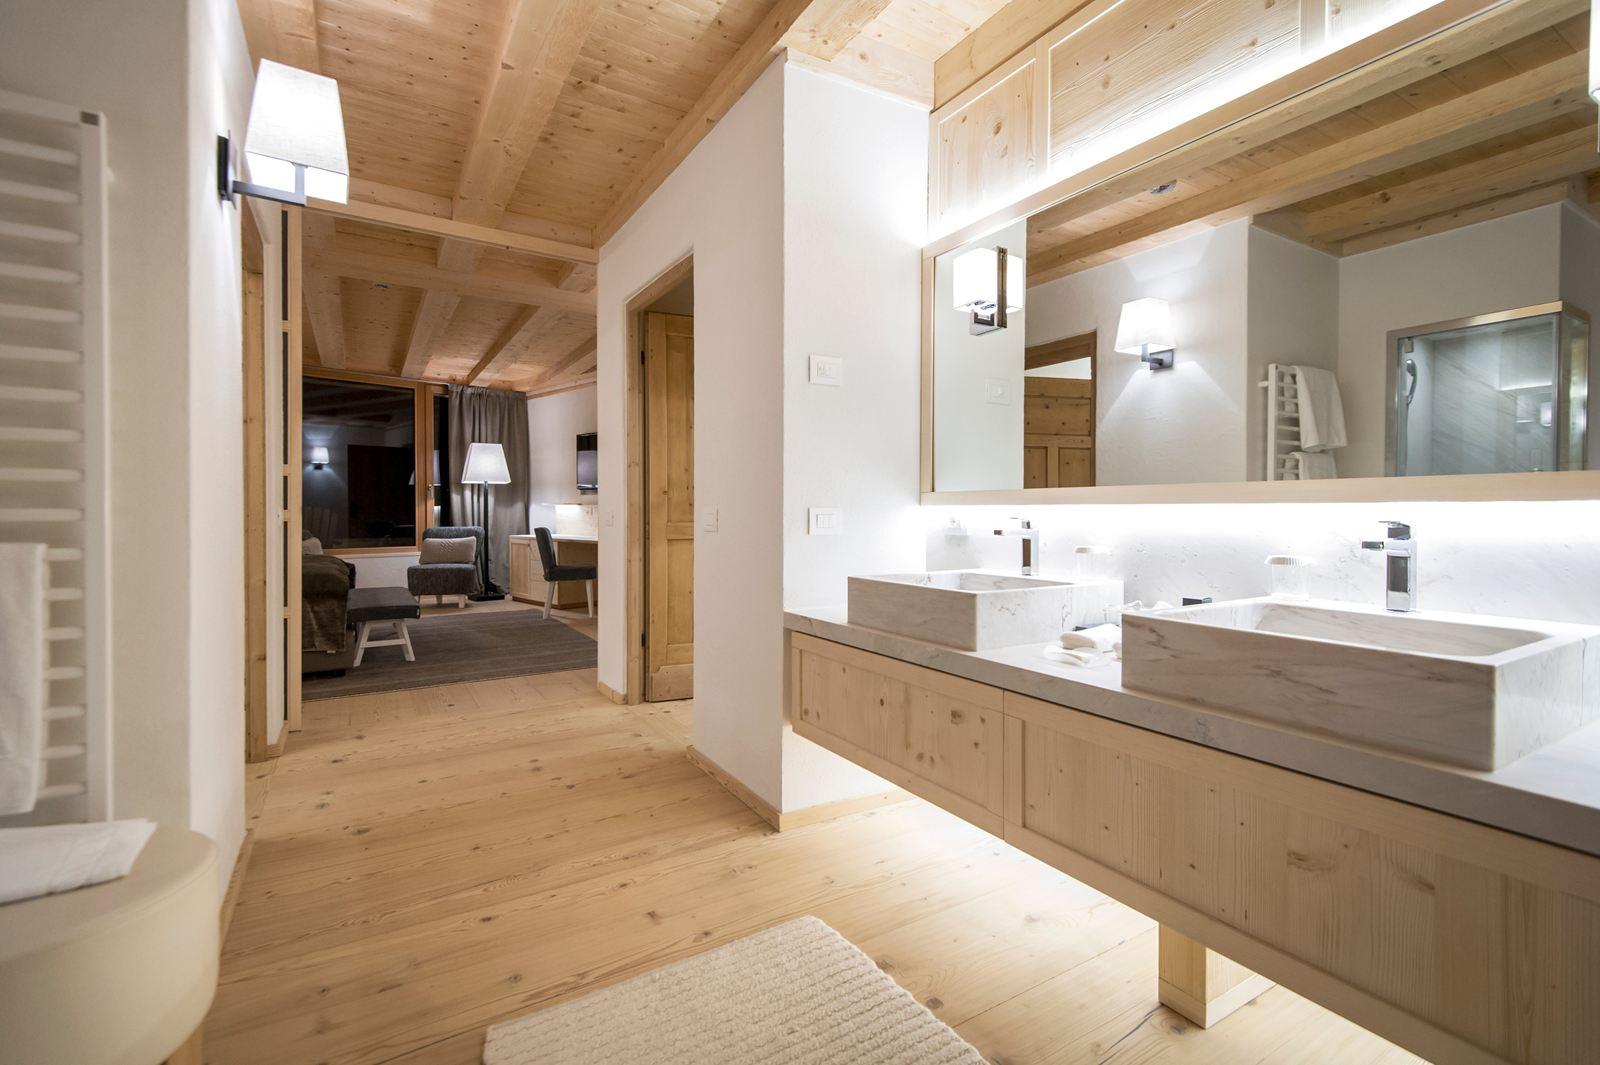 Bagno - Arredi case moderne ...